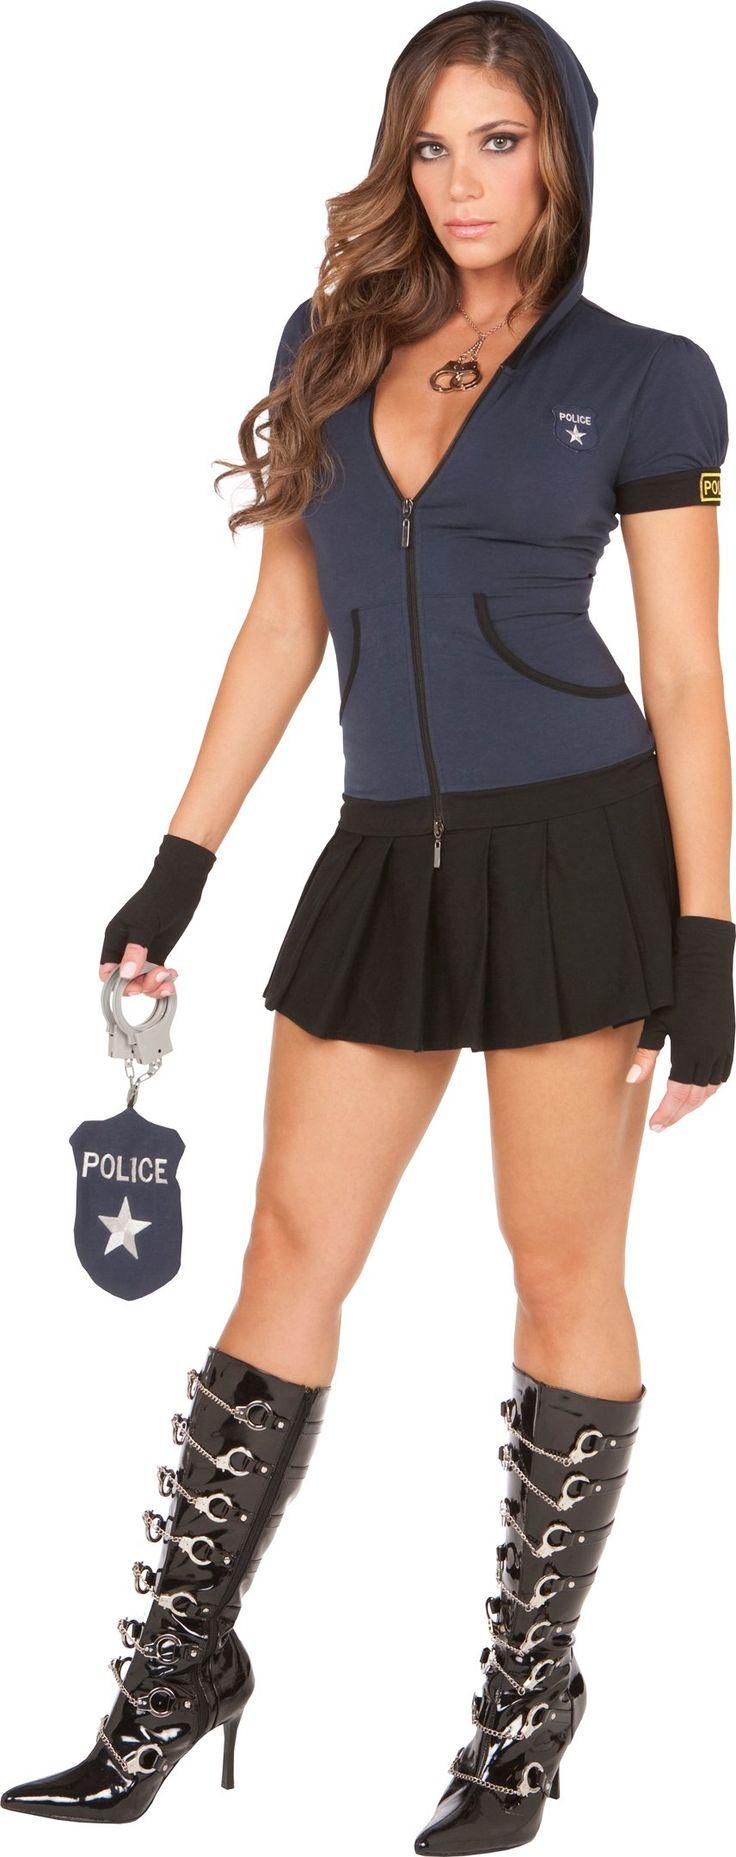 Miranda Rights Adult Costume,$56.99